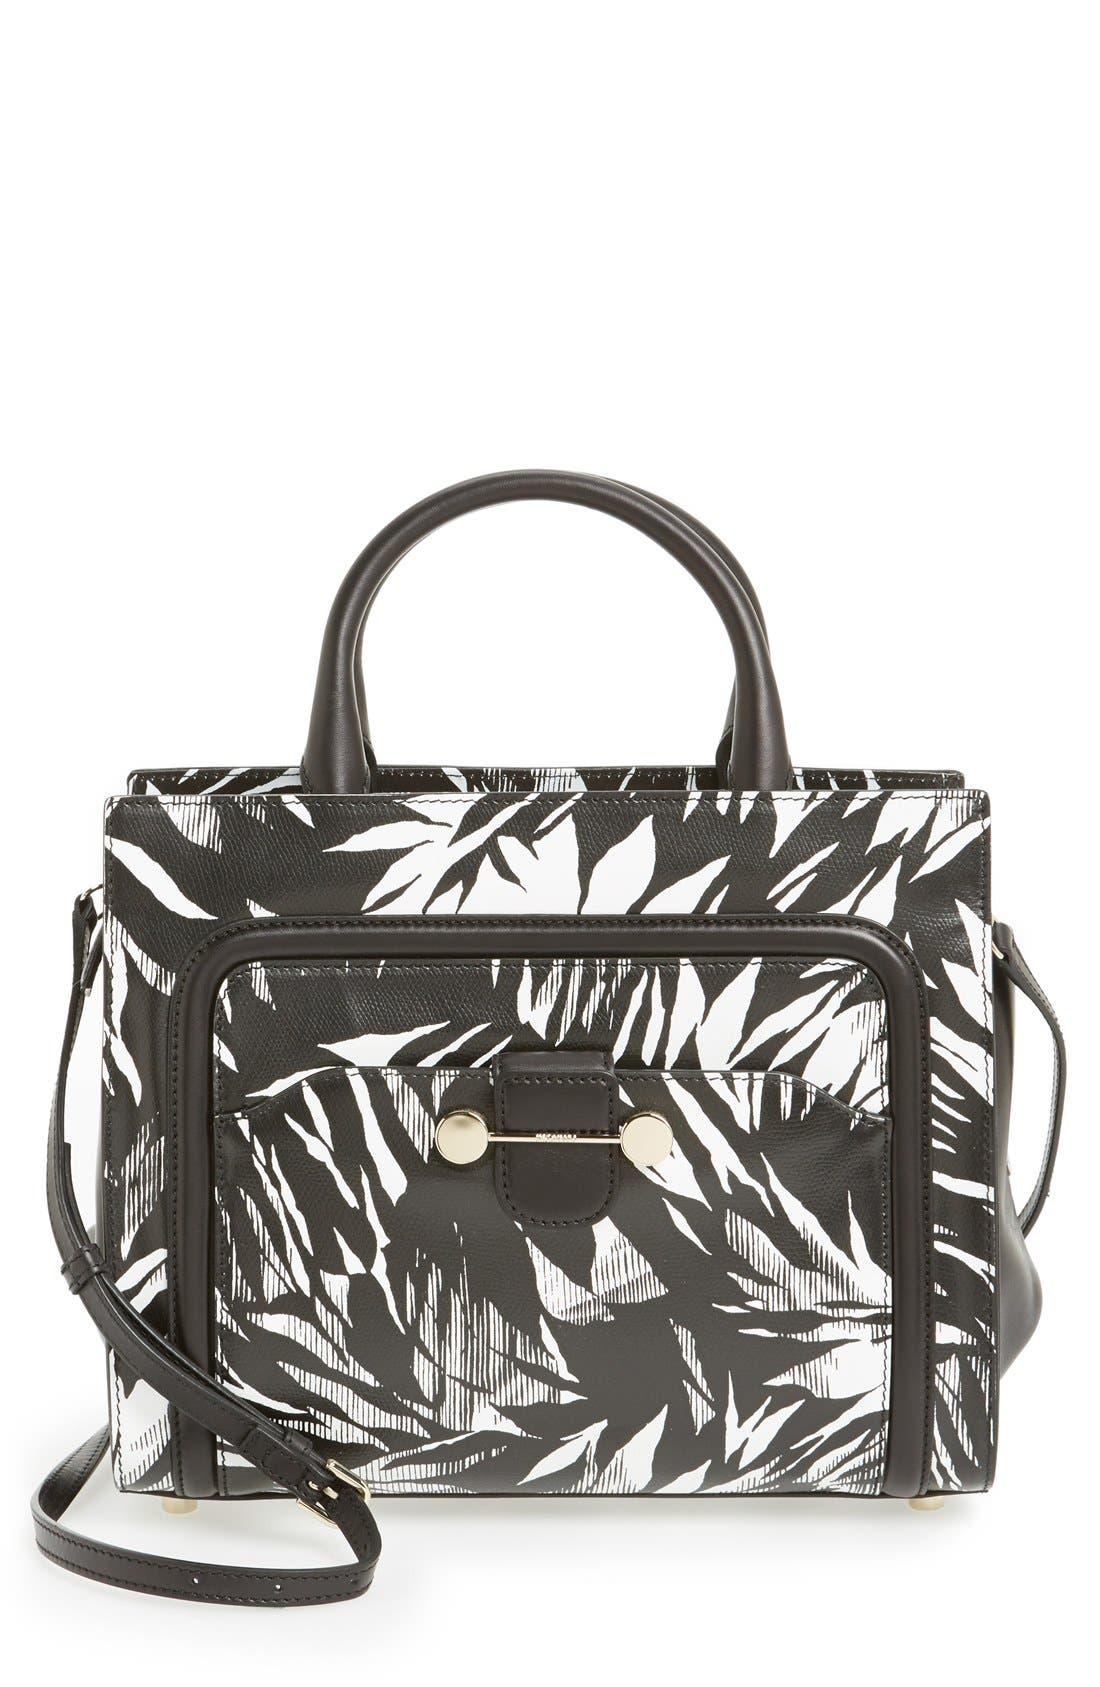 Alternate Image 1 Selected - Jason Wu 'Daphne 2' Tropical Print Crossbody Bag